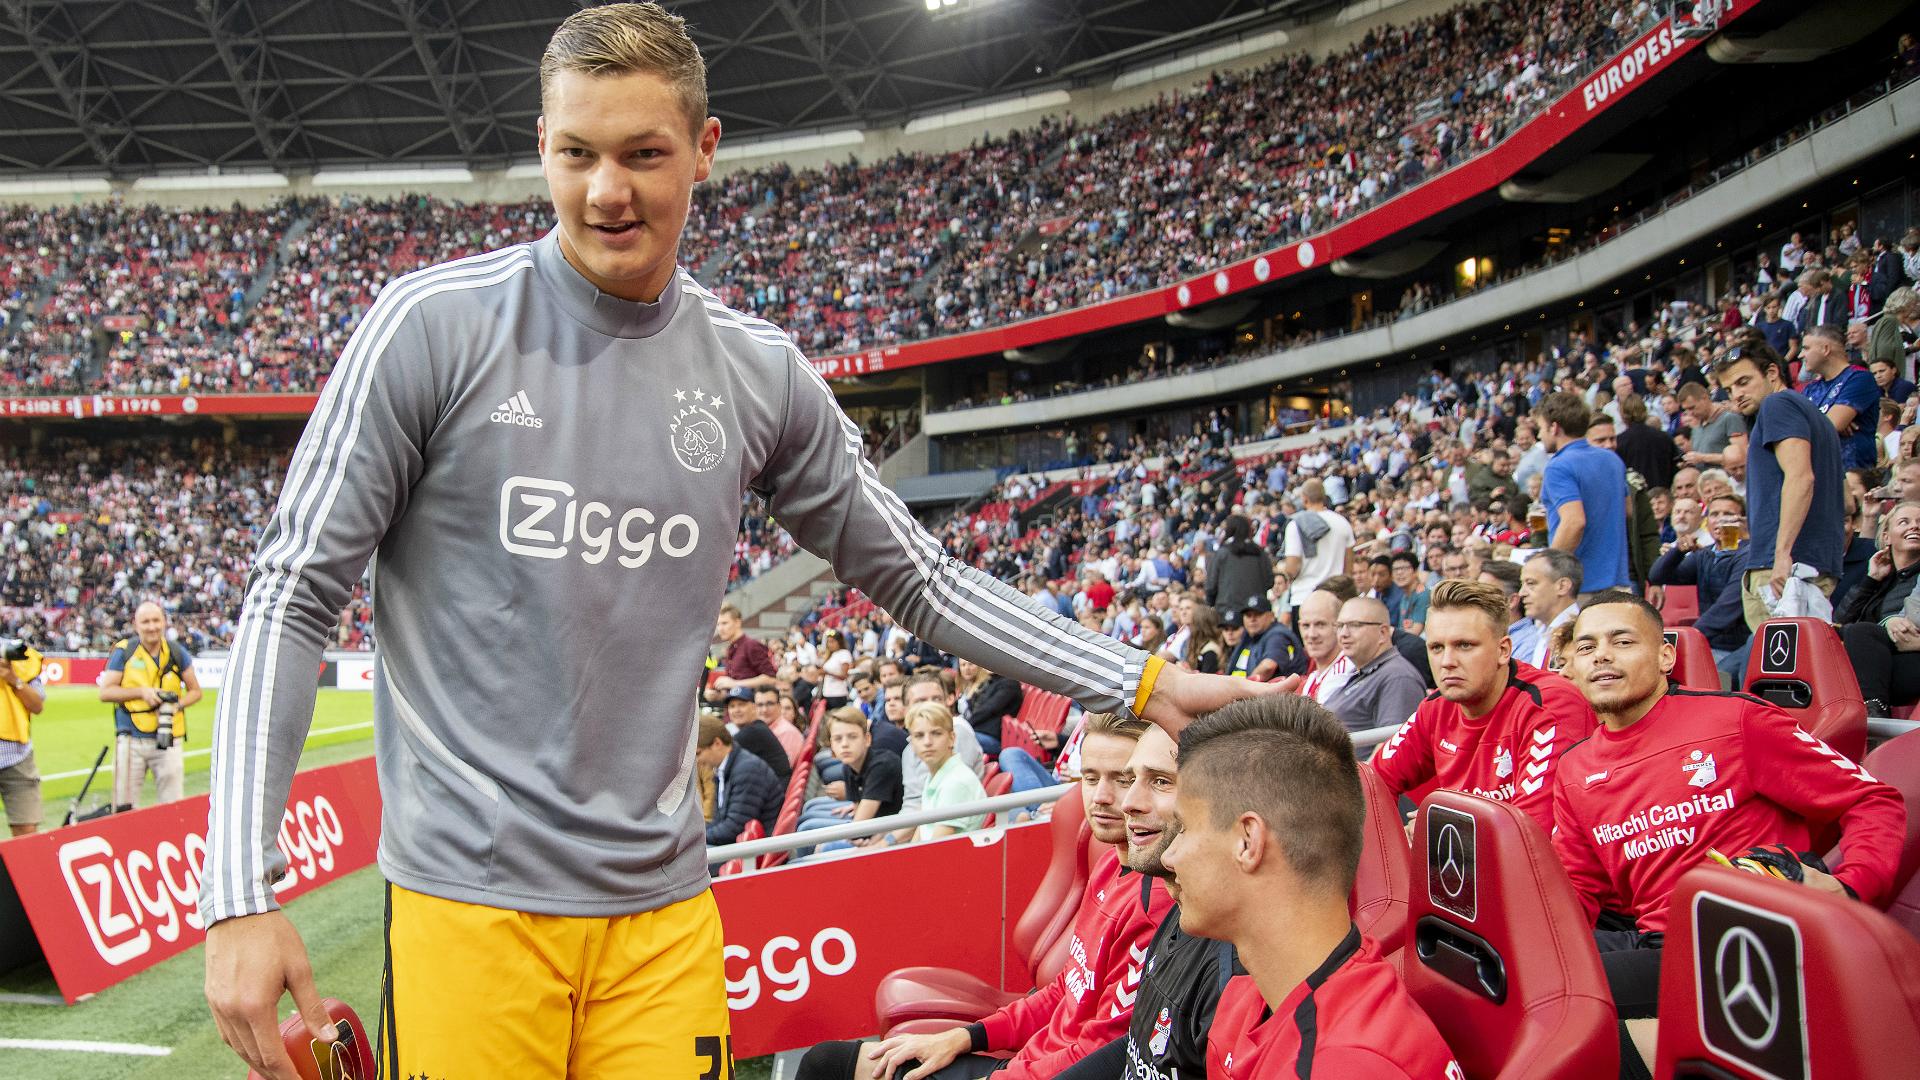 Stekelenburg ko, Ajax-Roma a rischio: debutta il terzo portiere Scherpen?